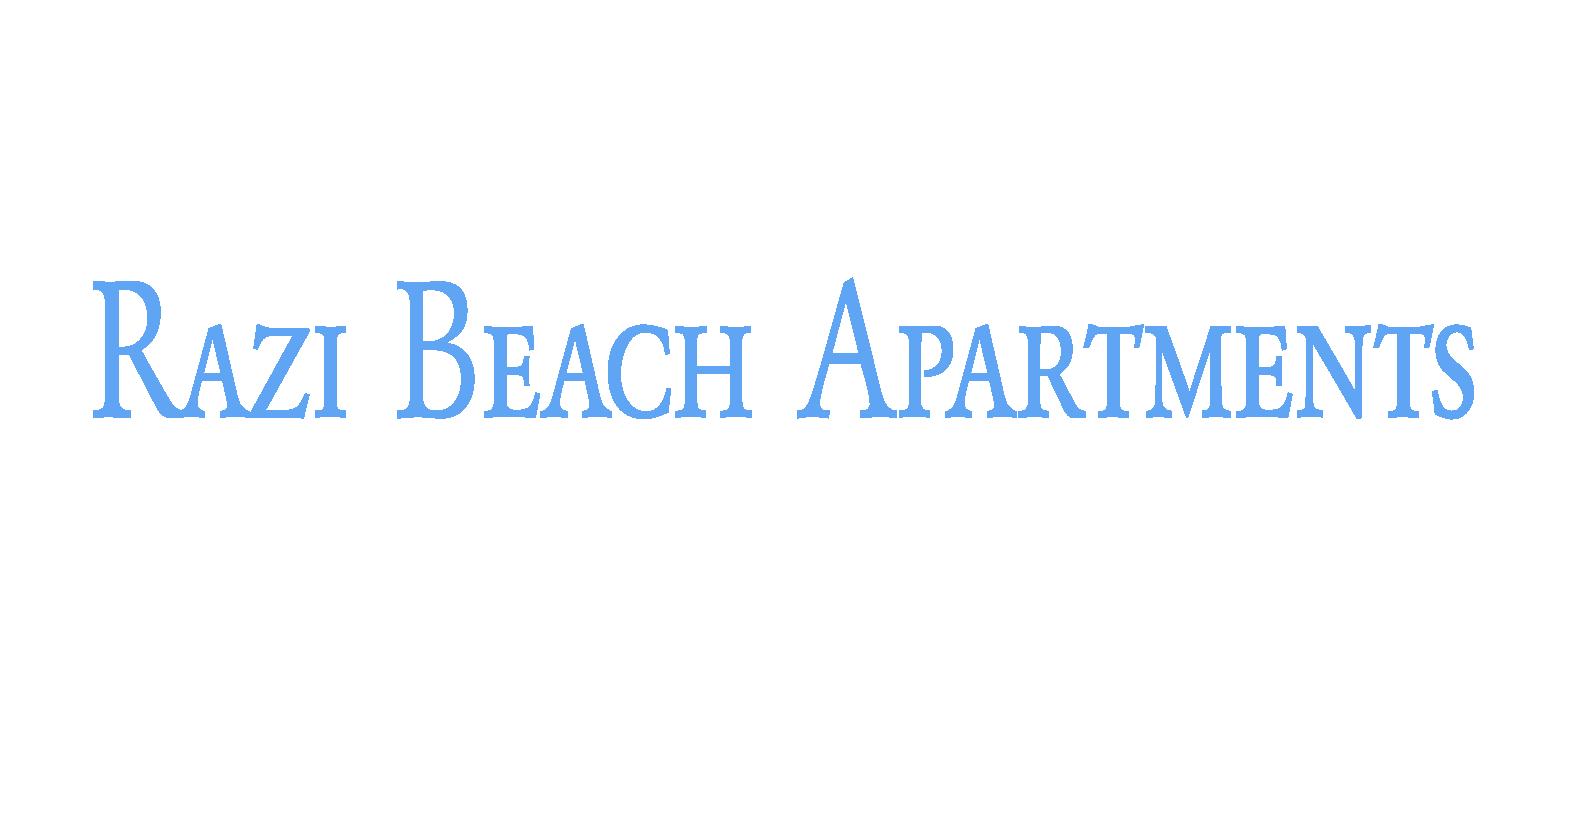 Razi beach εξοχικές κατοικίες - Razi beach - Λεφόκαστρο Πήλιο